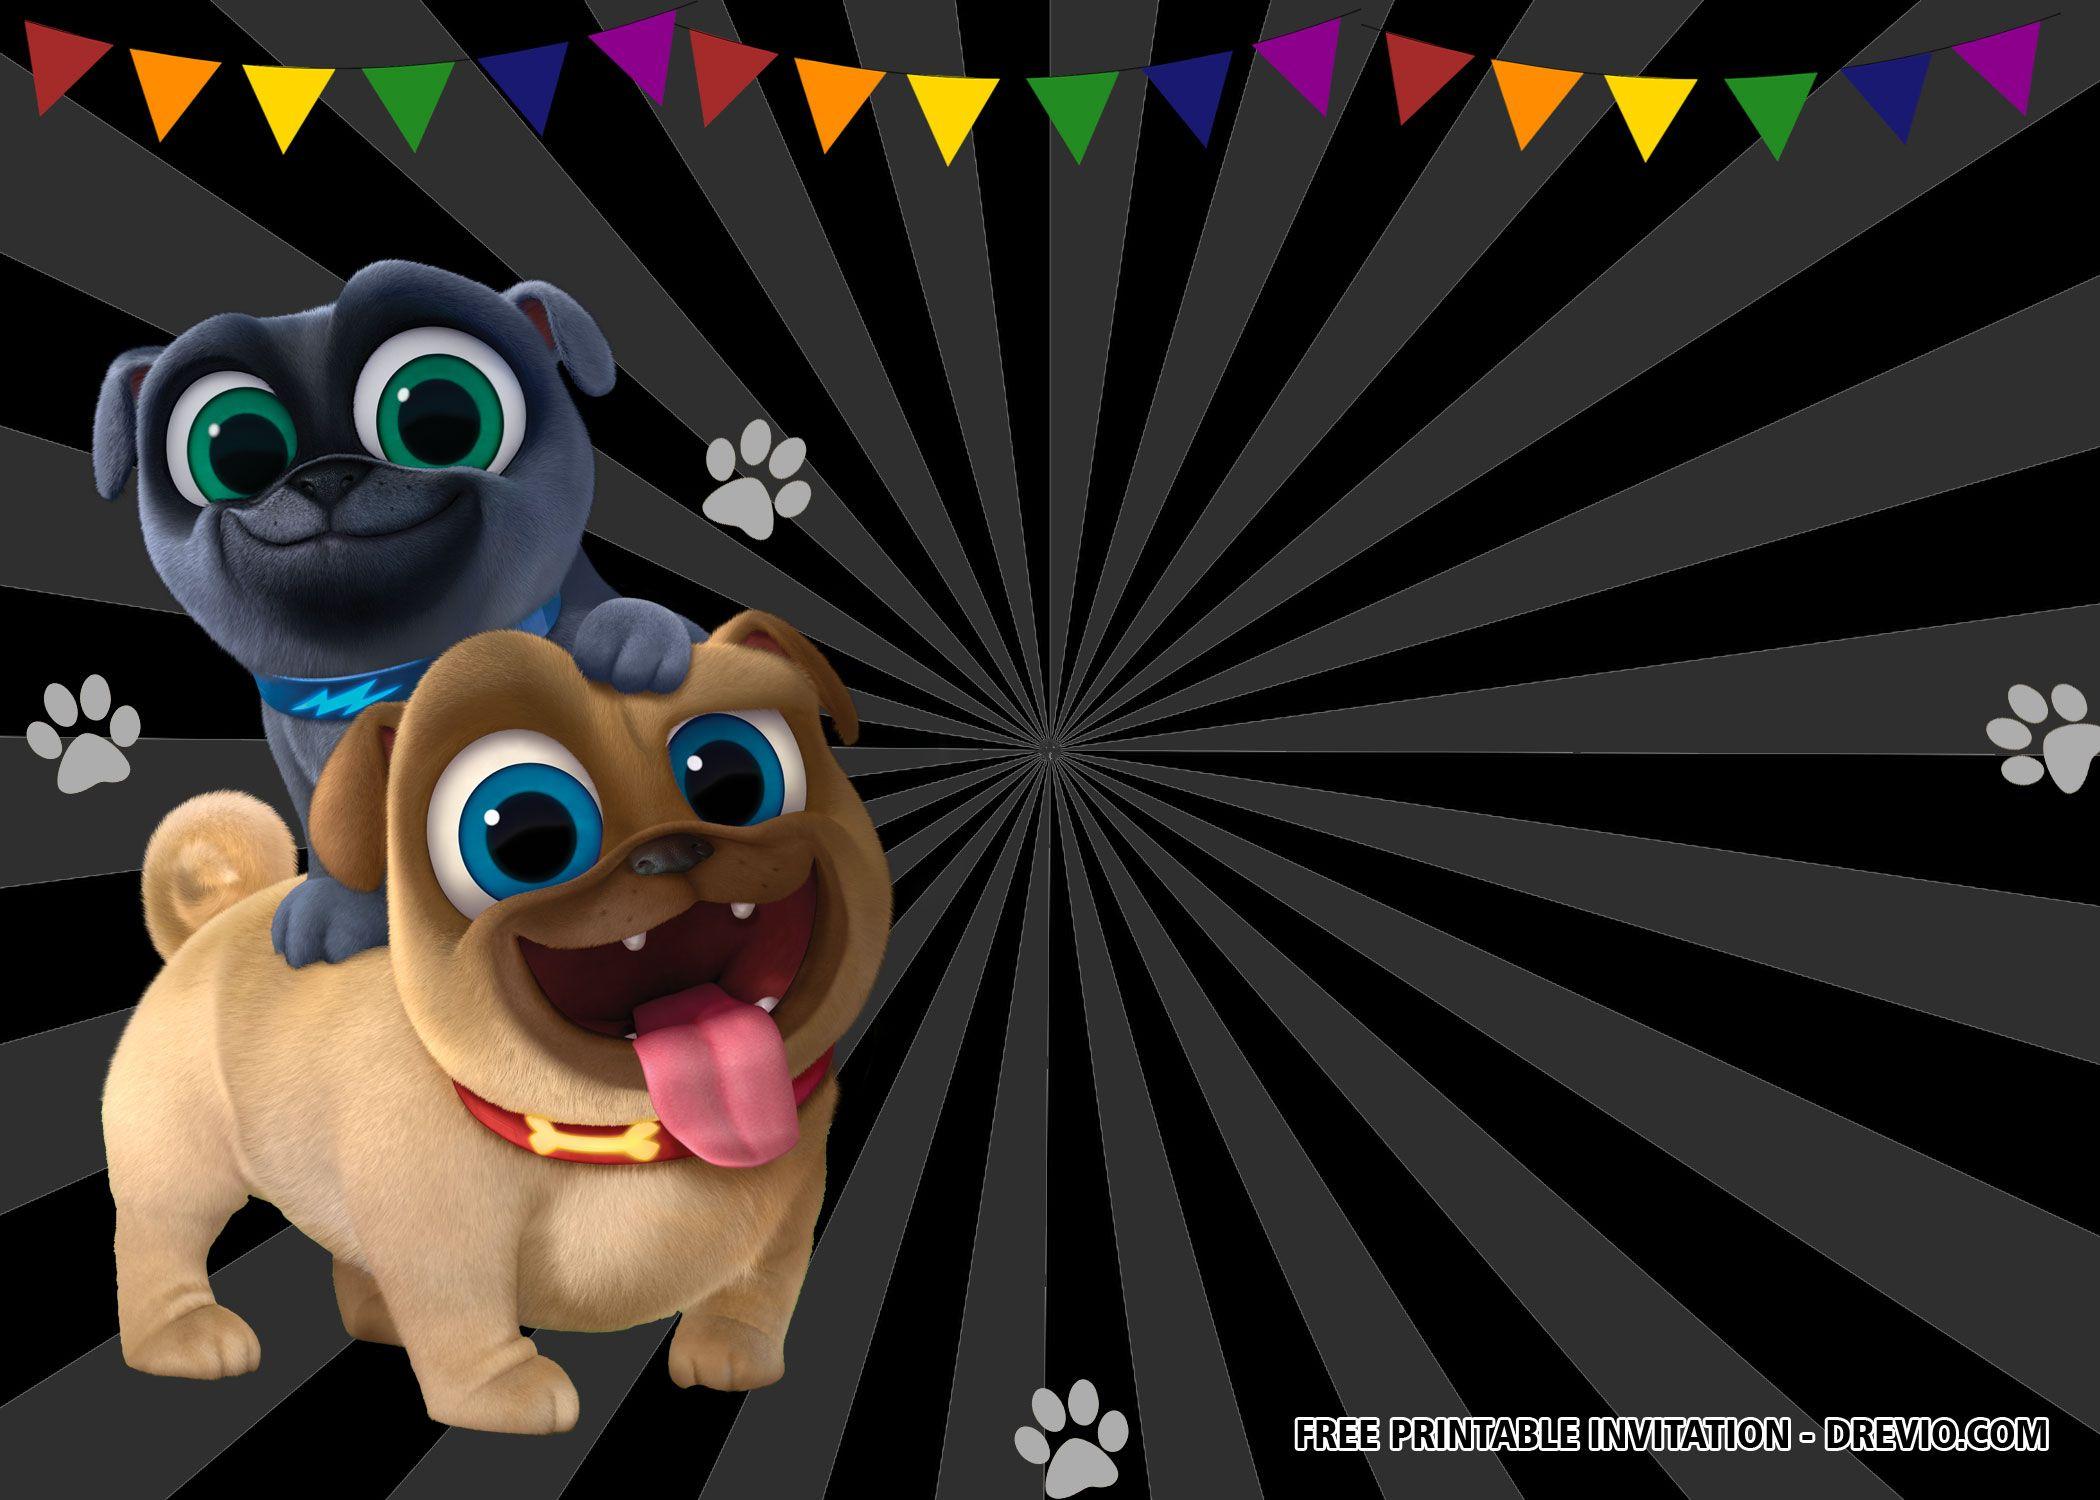 Free Puppy Dog Pals Birthday Invitation Templates Disney Invitations Free Puppies 2nd Birthday Party Themes